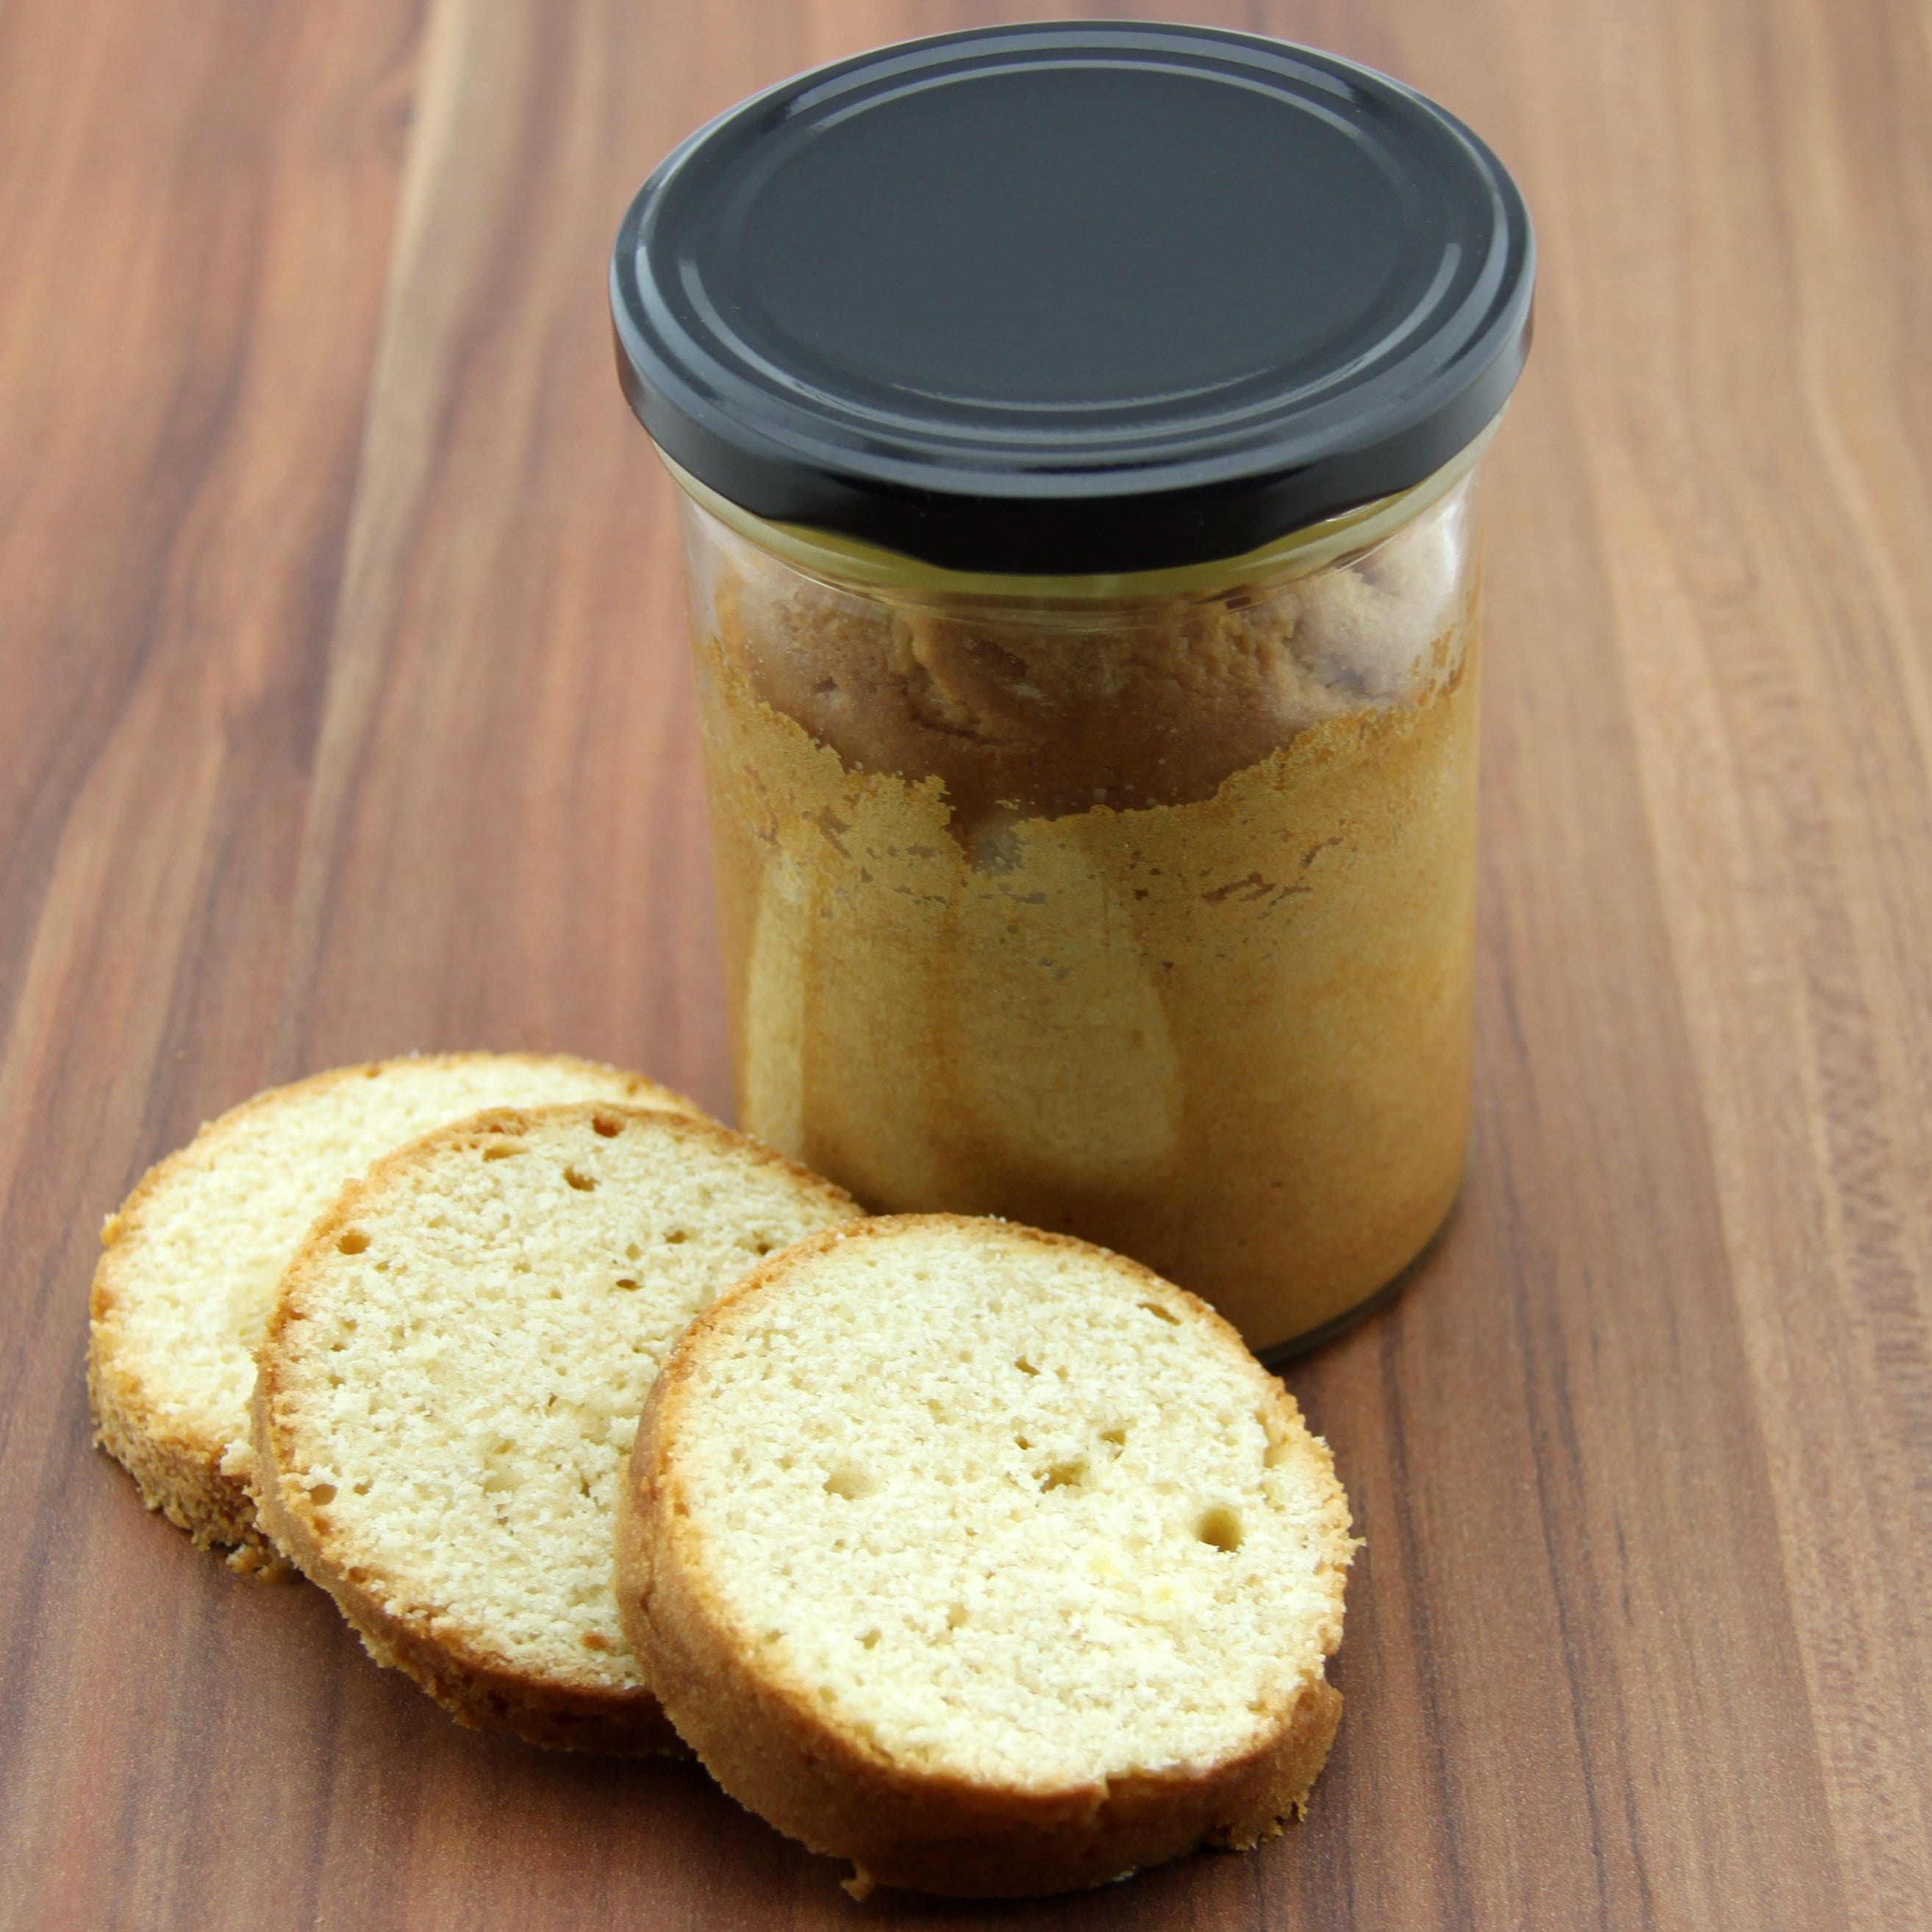 my-bakery Kuchen im Glas Zitrone 435 ml